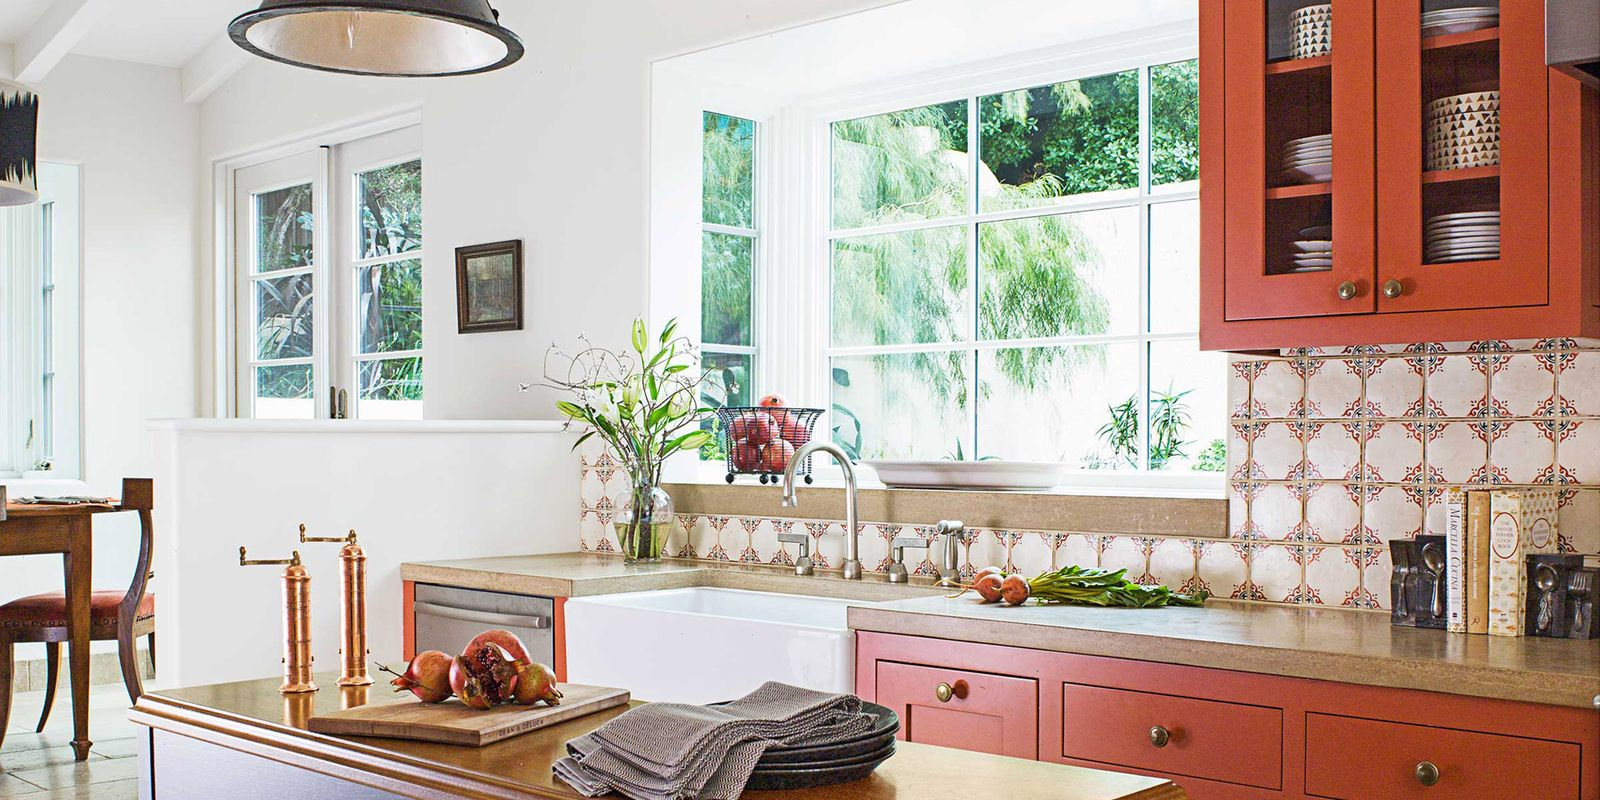 Http Www Housebeautiful Com Room Decorating Kitchens G1857 Burnt Orange Kitchen 0514